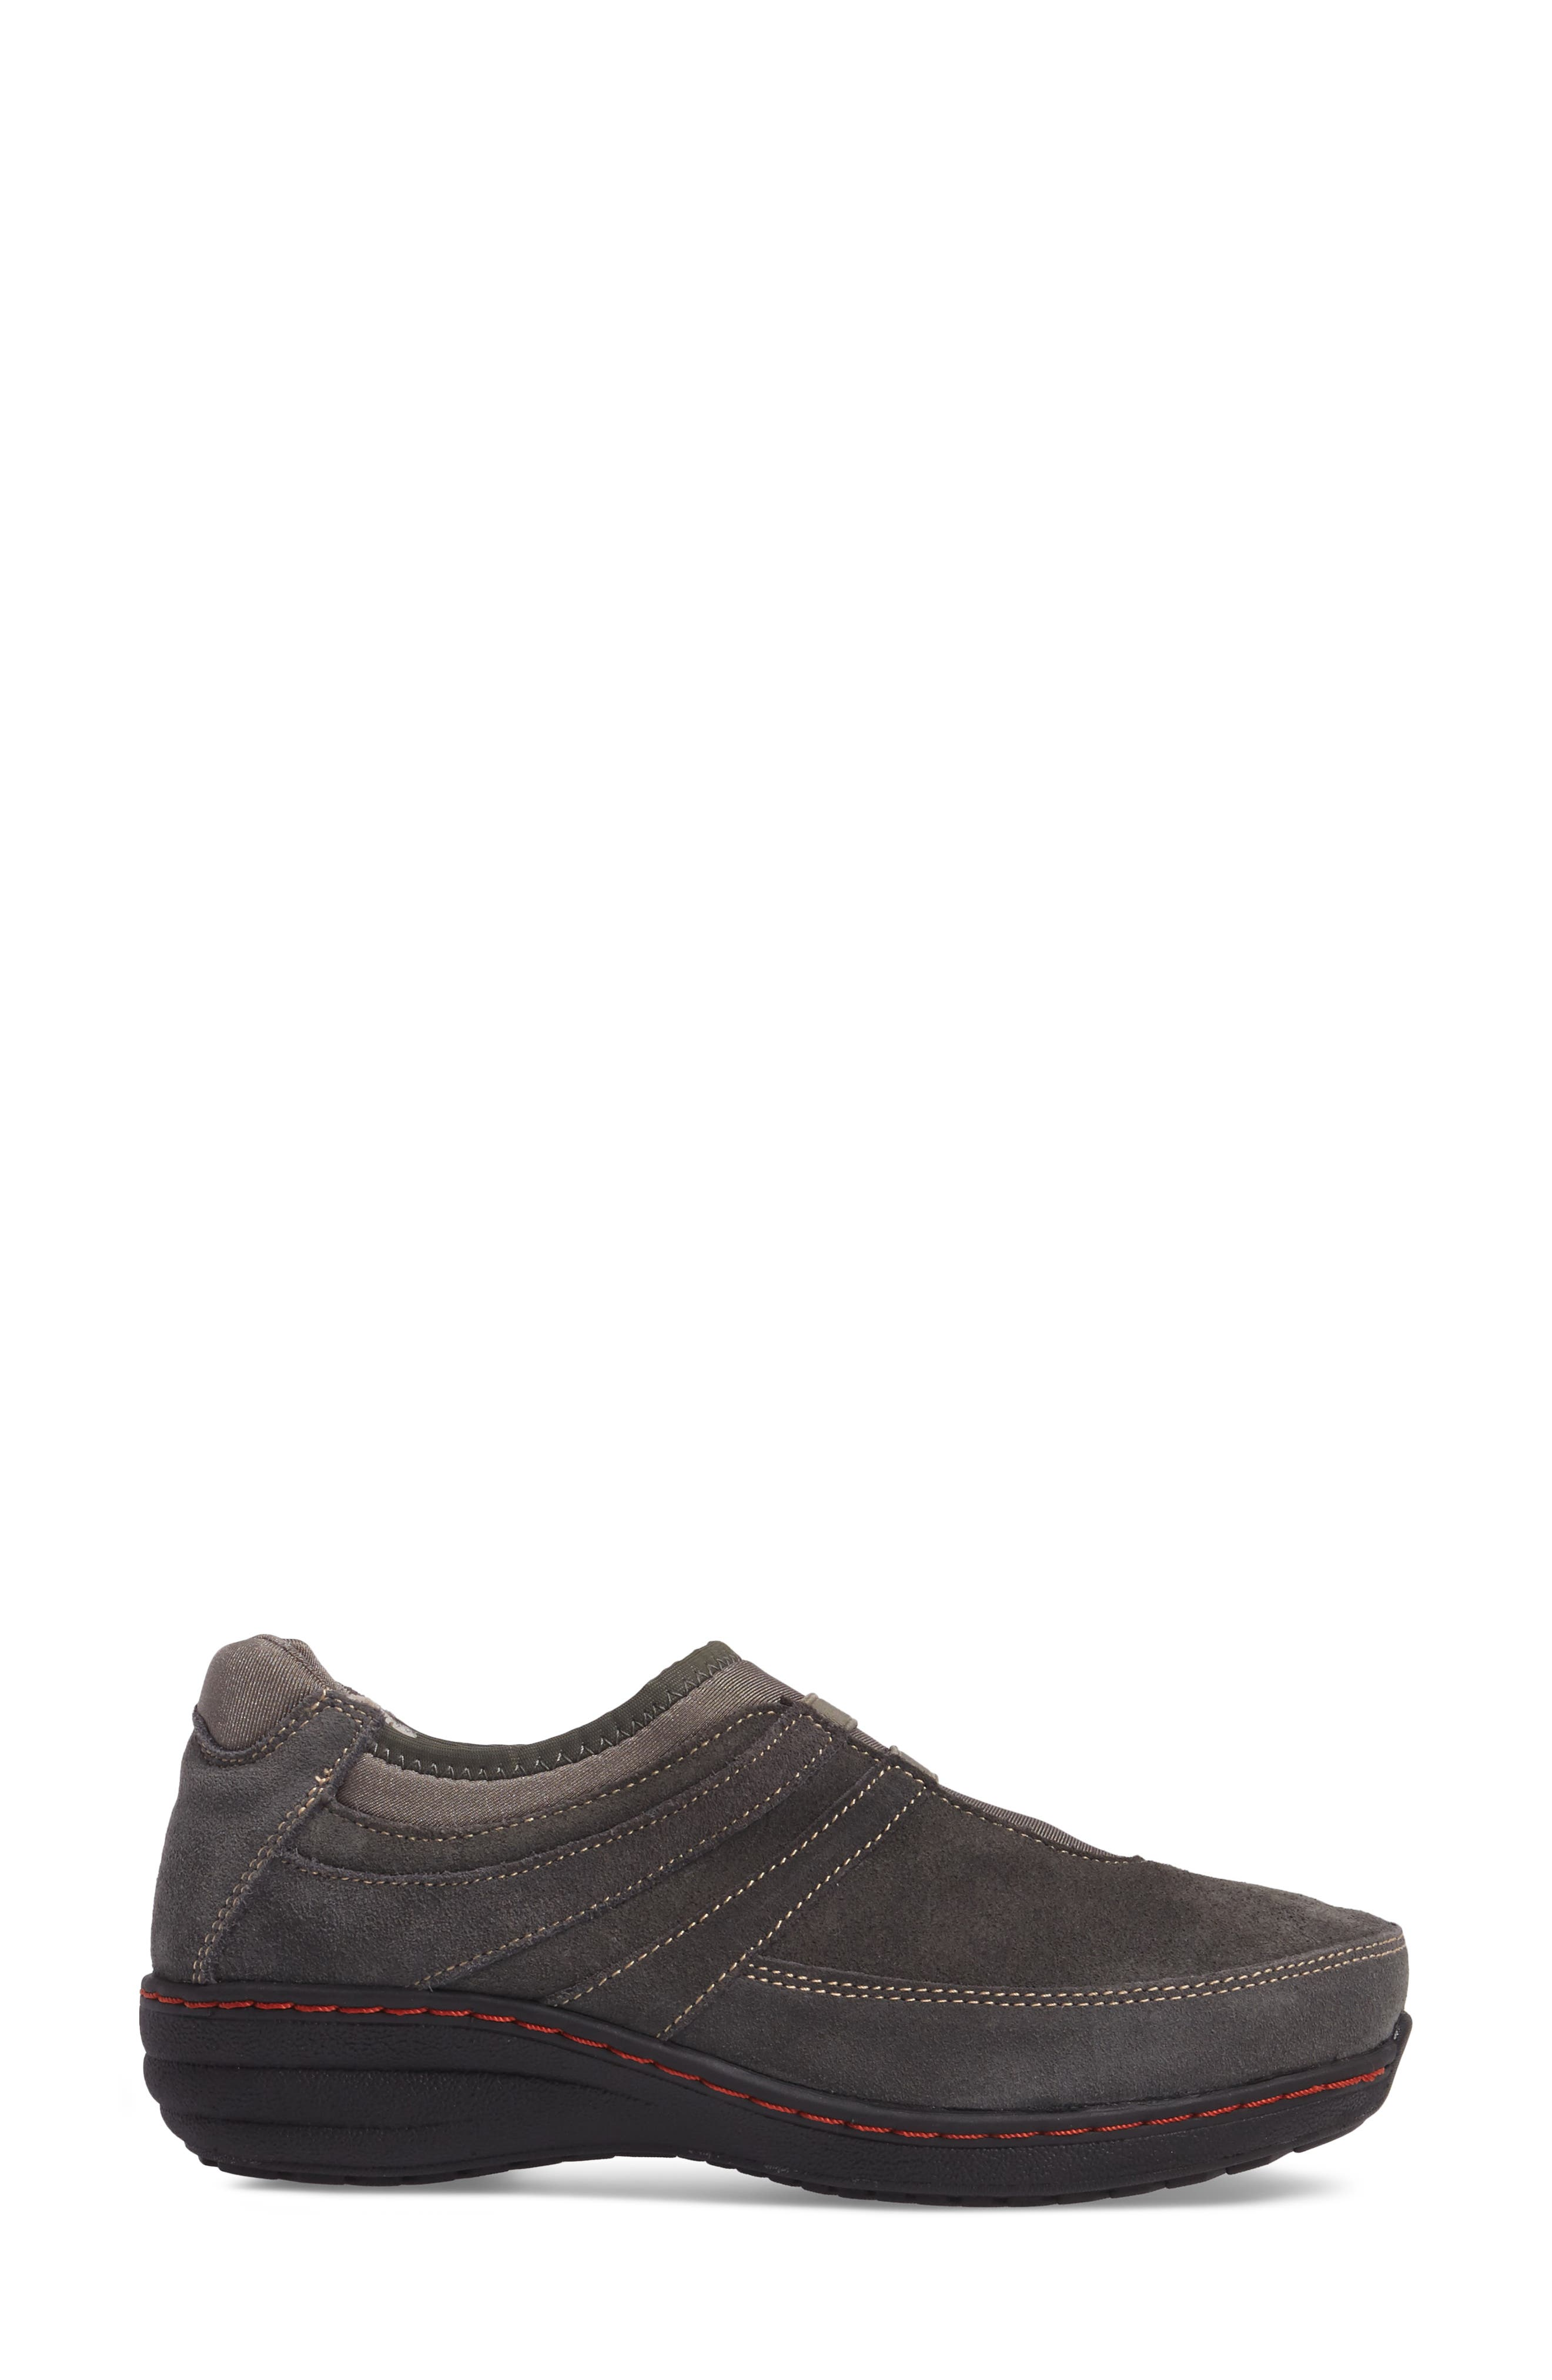 Alternate Image 3  - Aetrex Berries Slip-On Sneaker (Women)